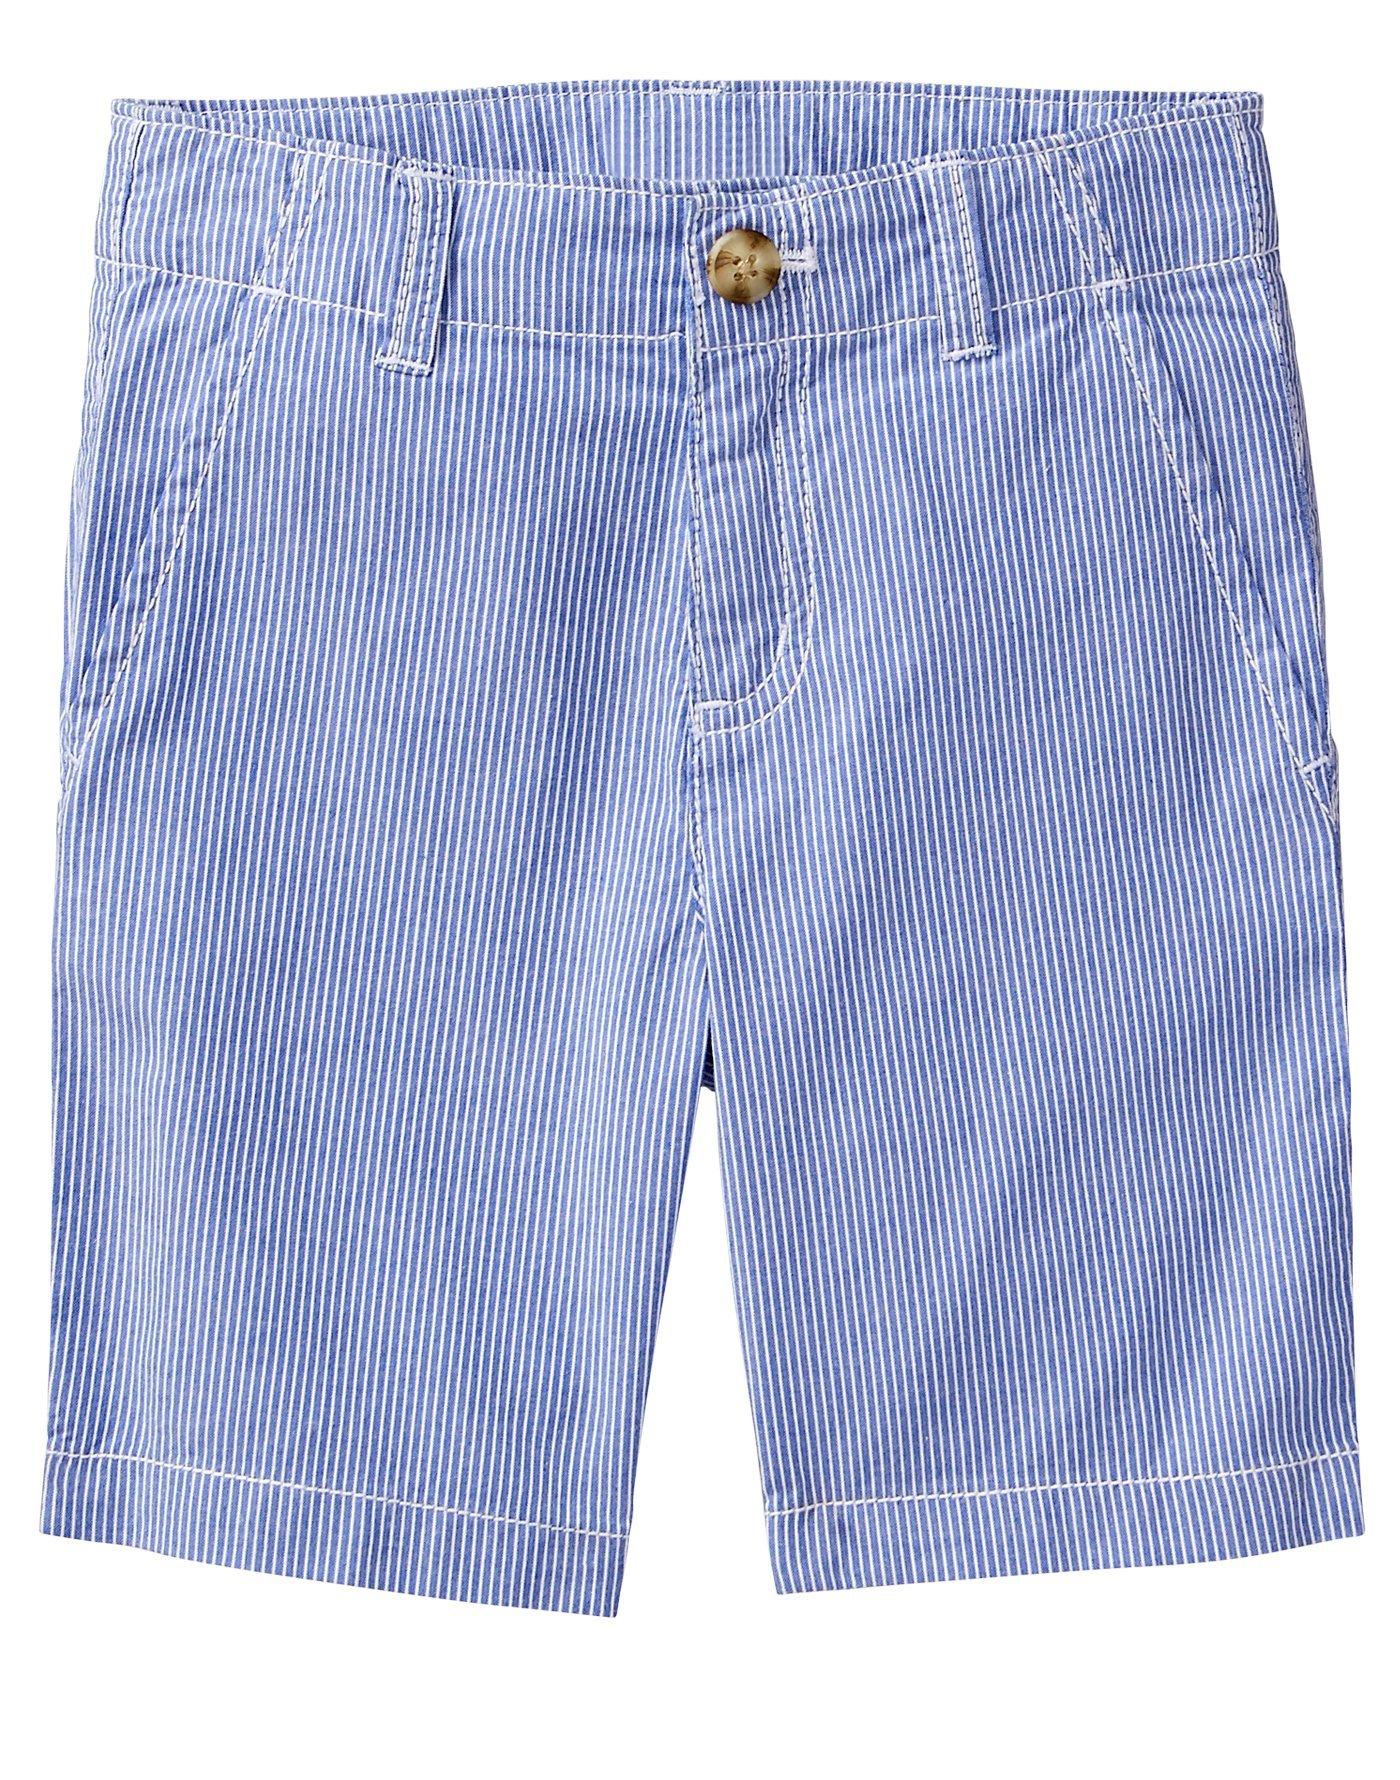 Gymboree Little Boys' Easy Shorts, Cornflower Stripe, 6